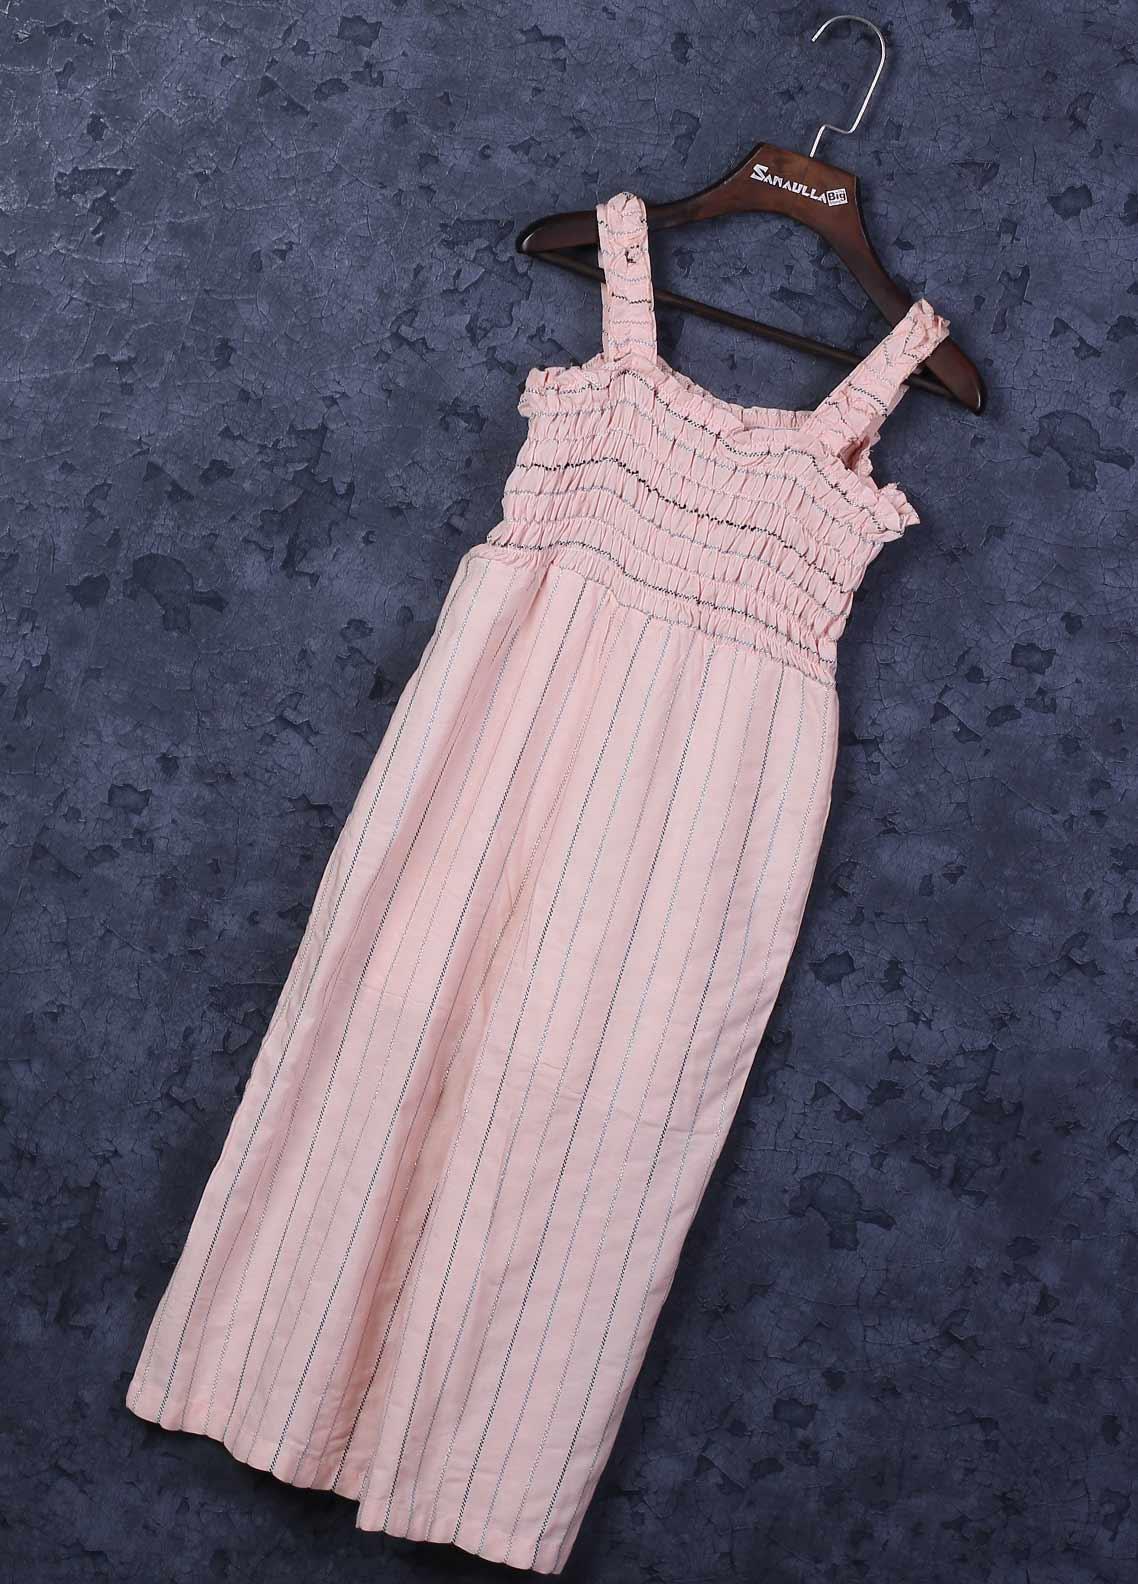 Sanaulla Exclusive Range Mix Cotton Fancy Frocks for Girls -  6050 Pink